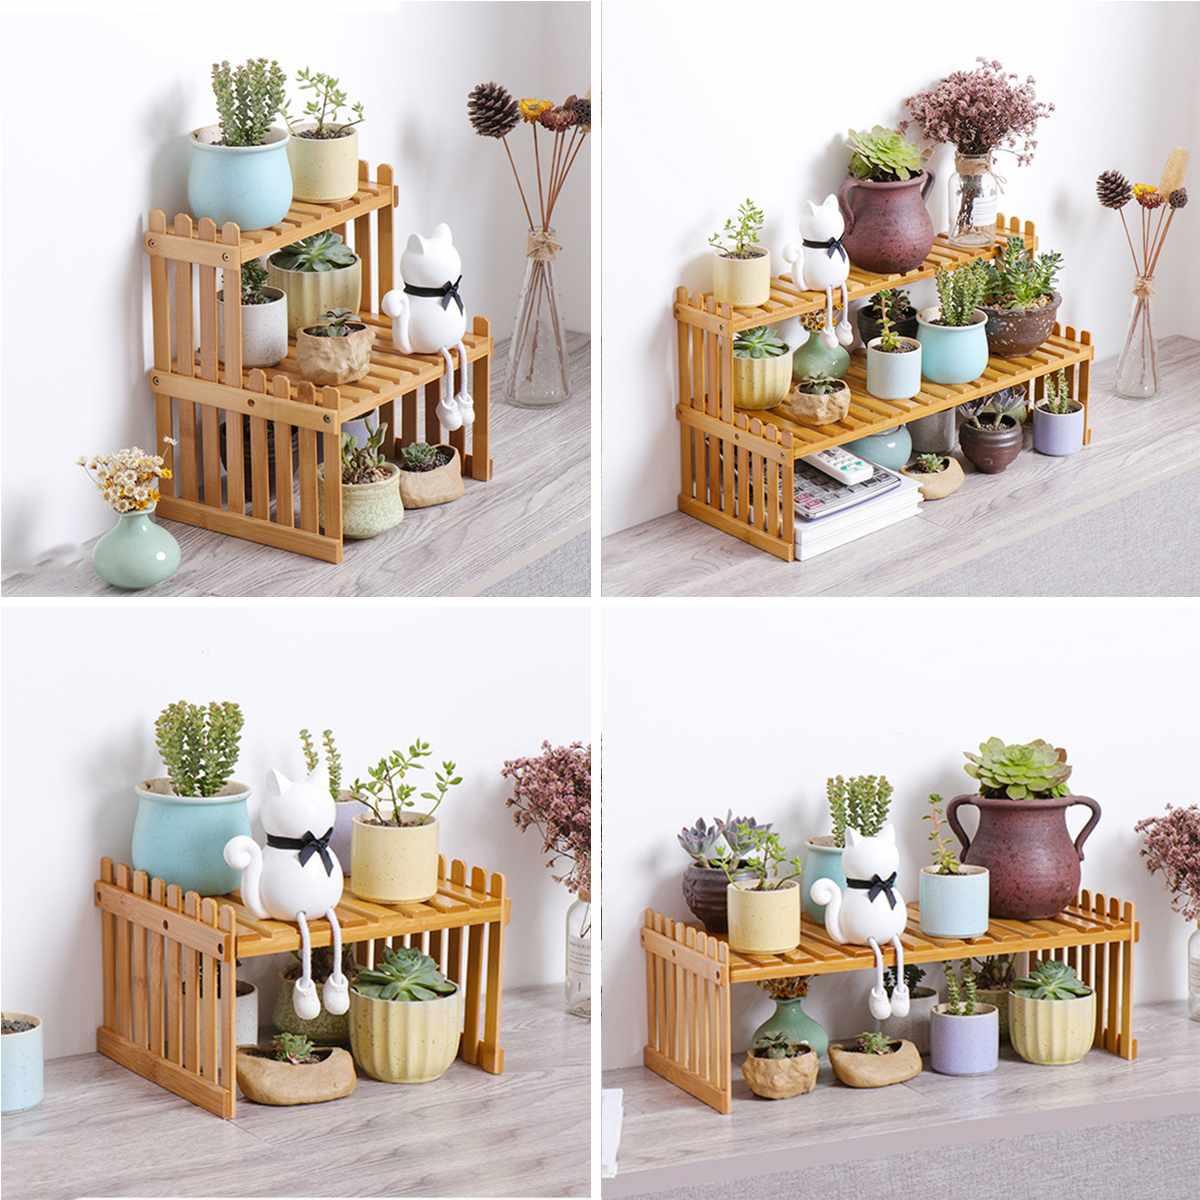 Natural Bamboo Plant Shelves Flower Garden Rack Stand Flower Display Stand Storage Shelf Organizer Home Desk Balcony Garden